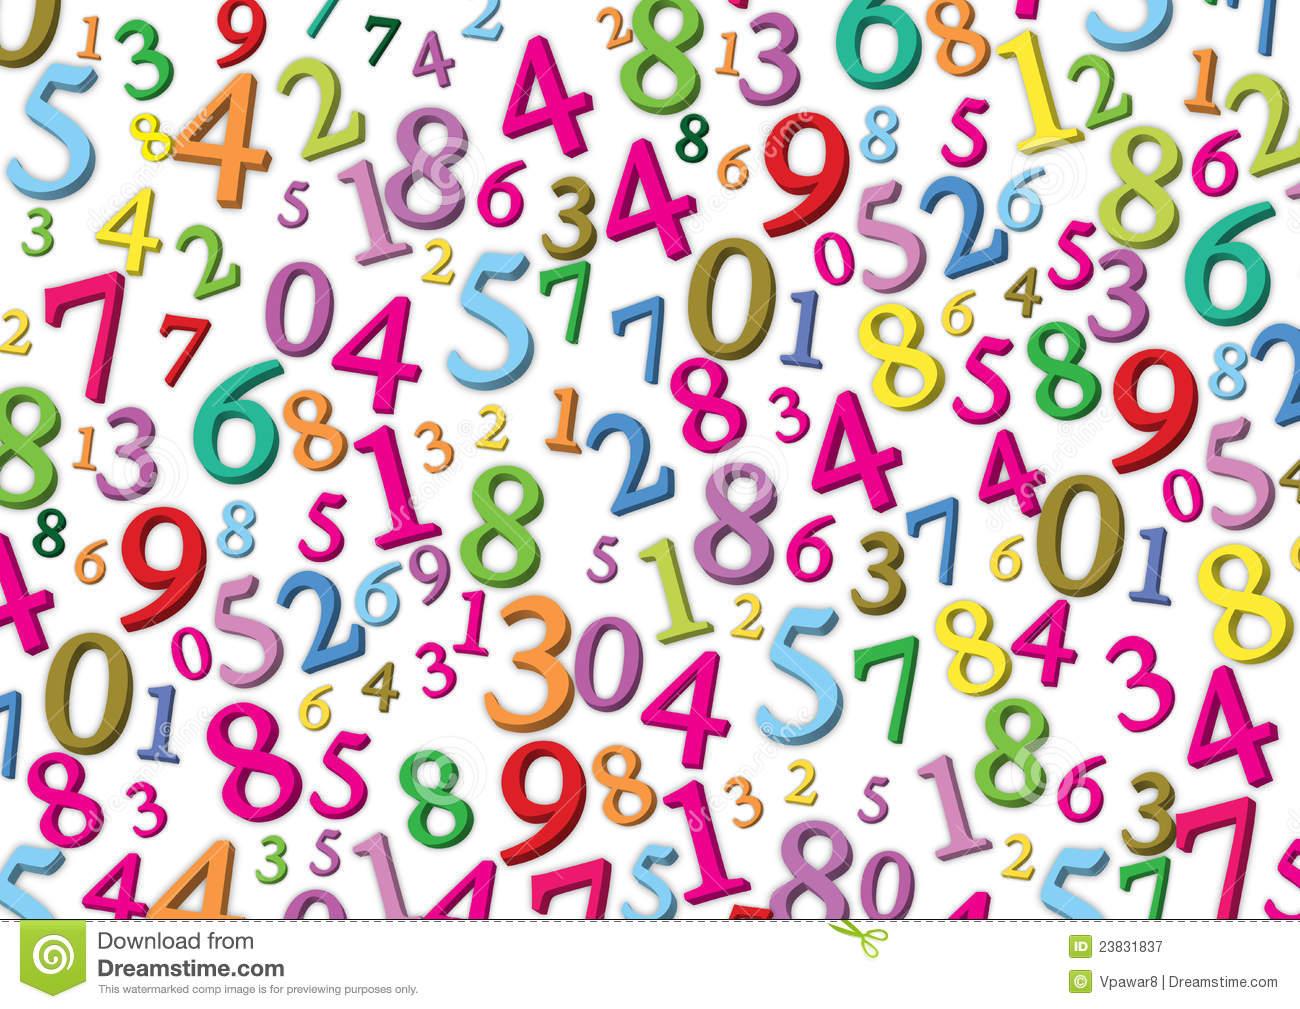 Numbers background. Numbers background. -Numbers background. Numbers background. download clipart-19